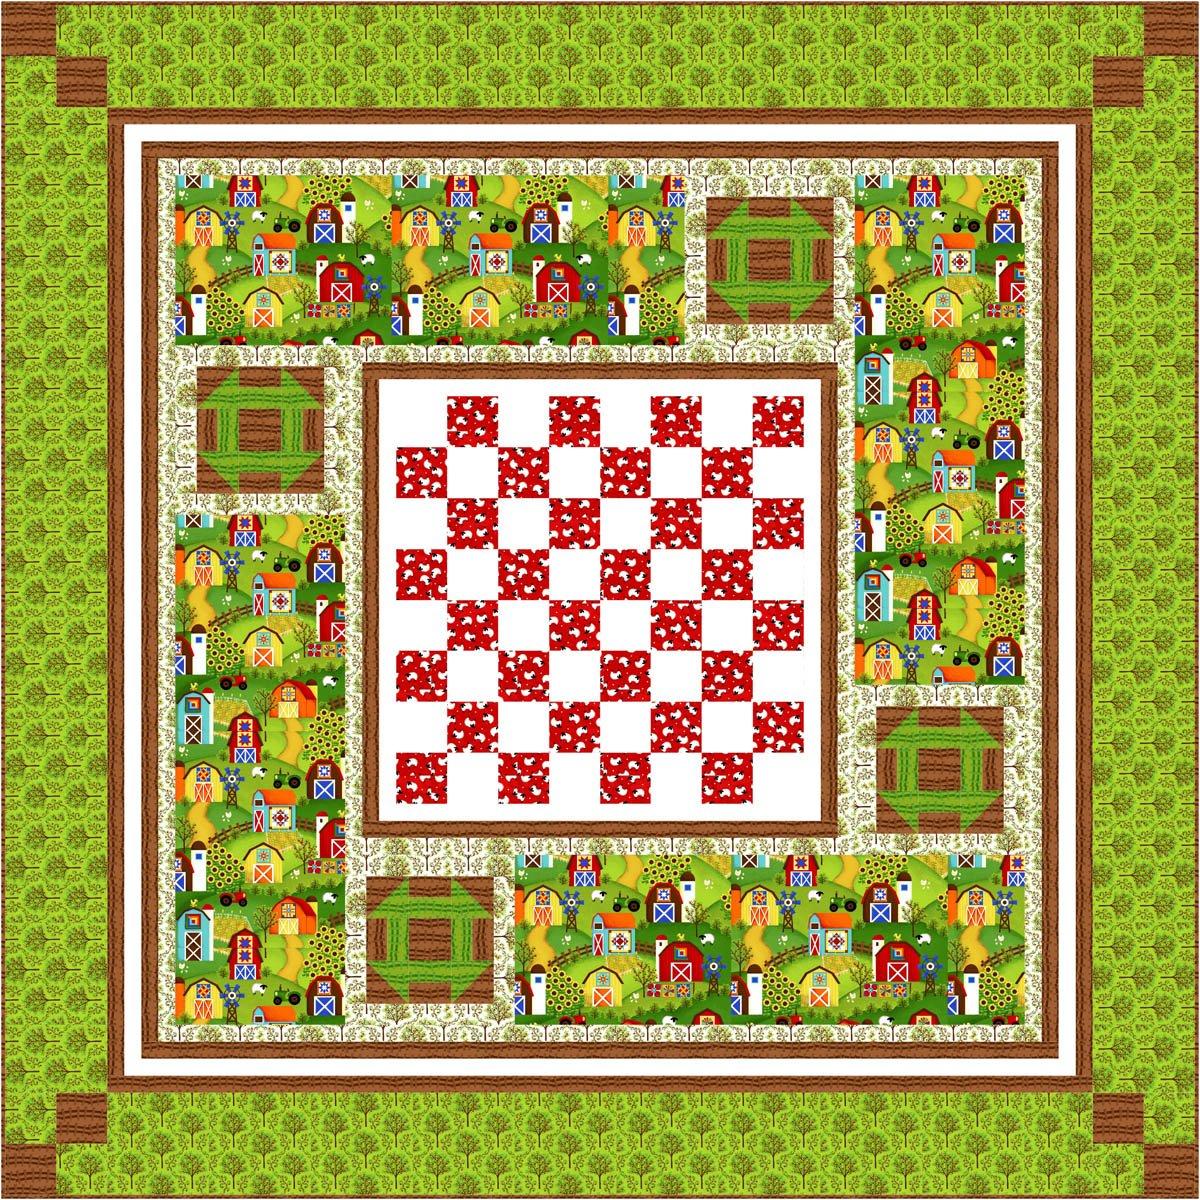 Barnyard Quilts Kit 70 x 70